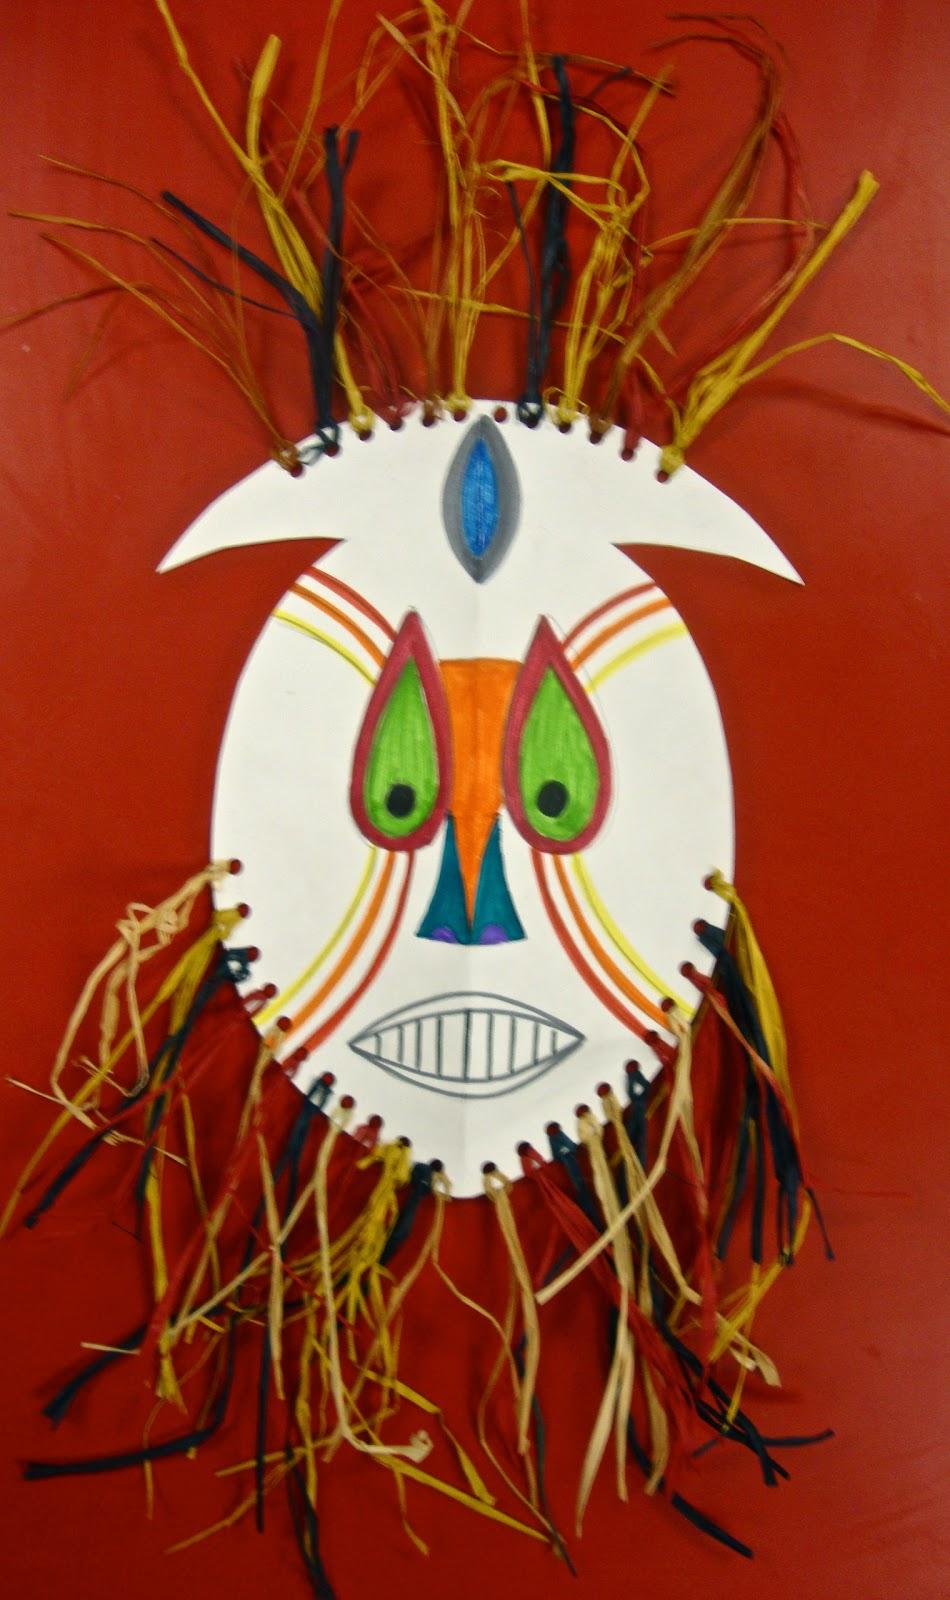 Art paper scissors glue african mask for Mask craft for kids